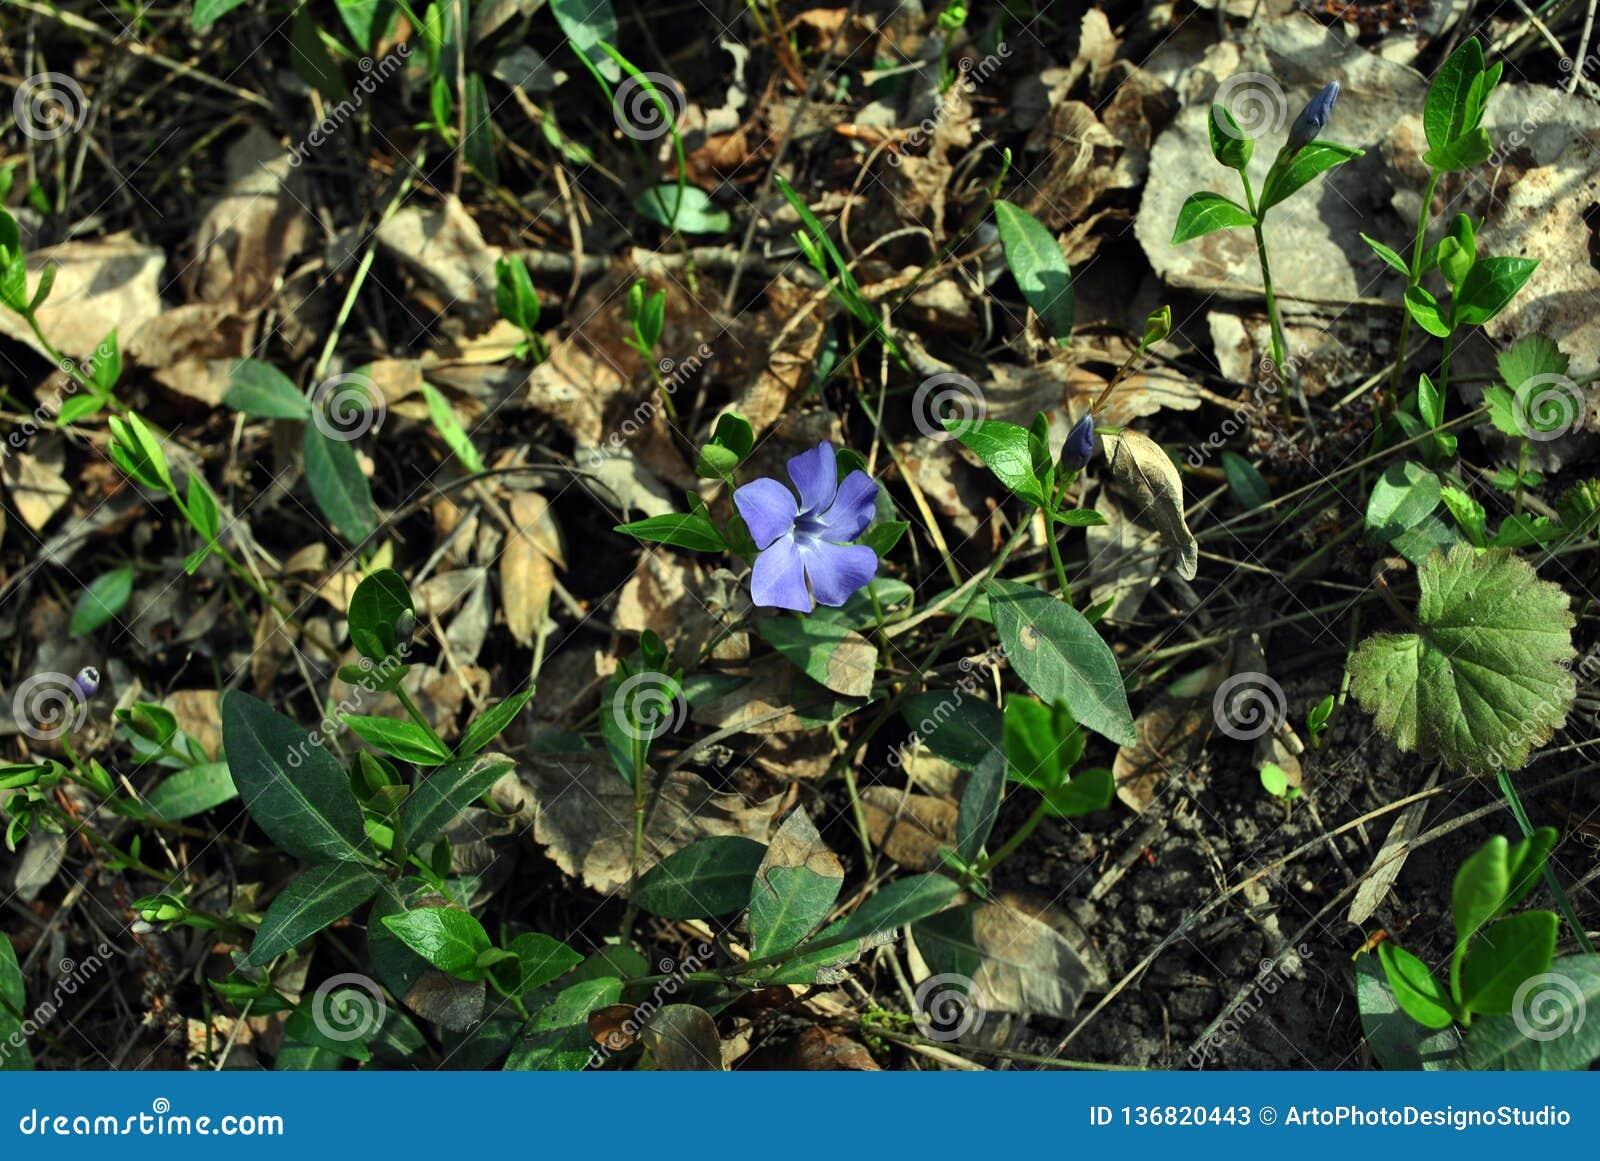 Vinca major bigleaf periwinkle, large periwinkle, greater periwinkle, blue periwinkle flower, grassand